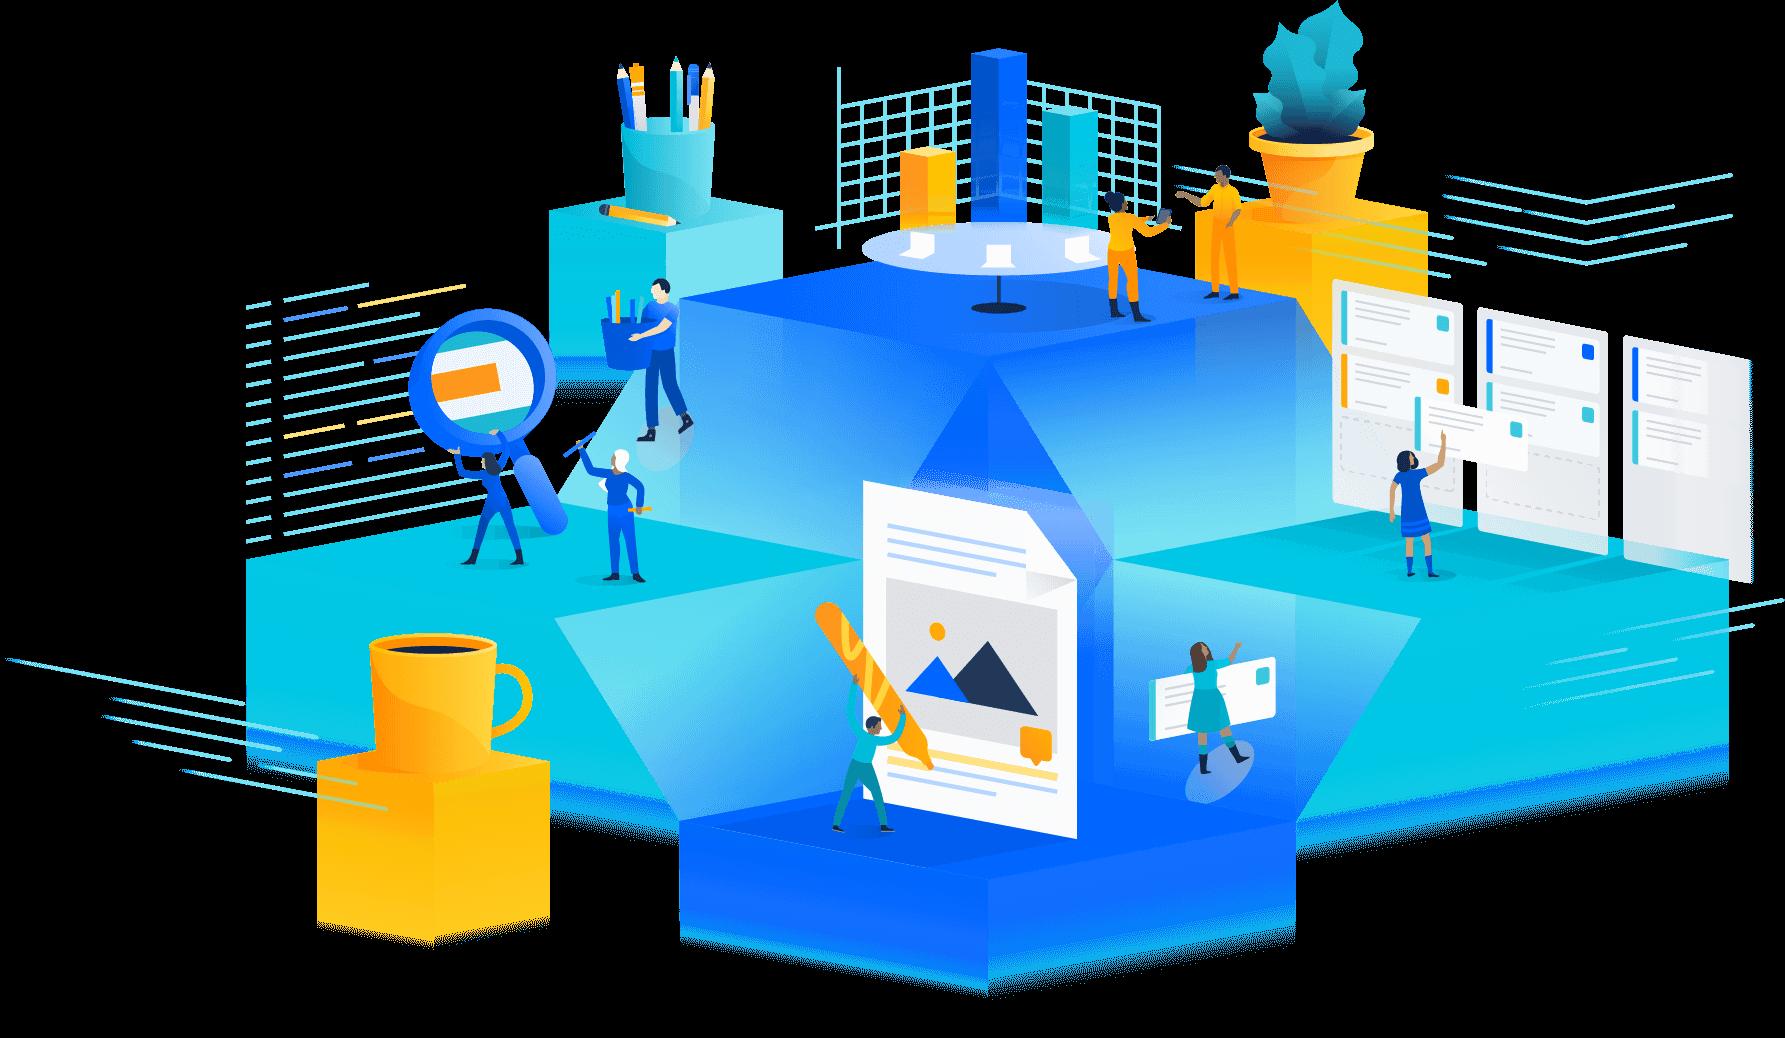 The Atlassian Stack Atlassian